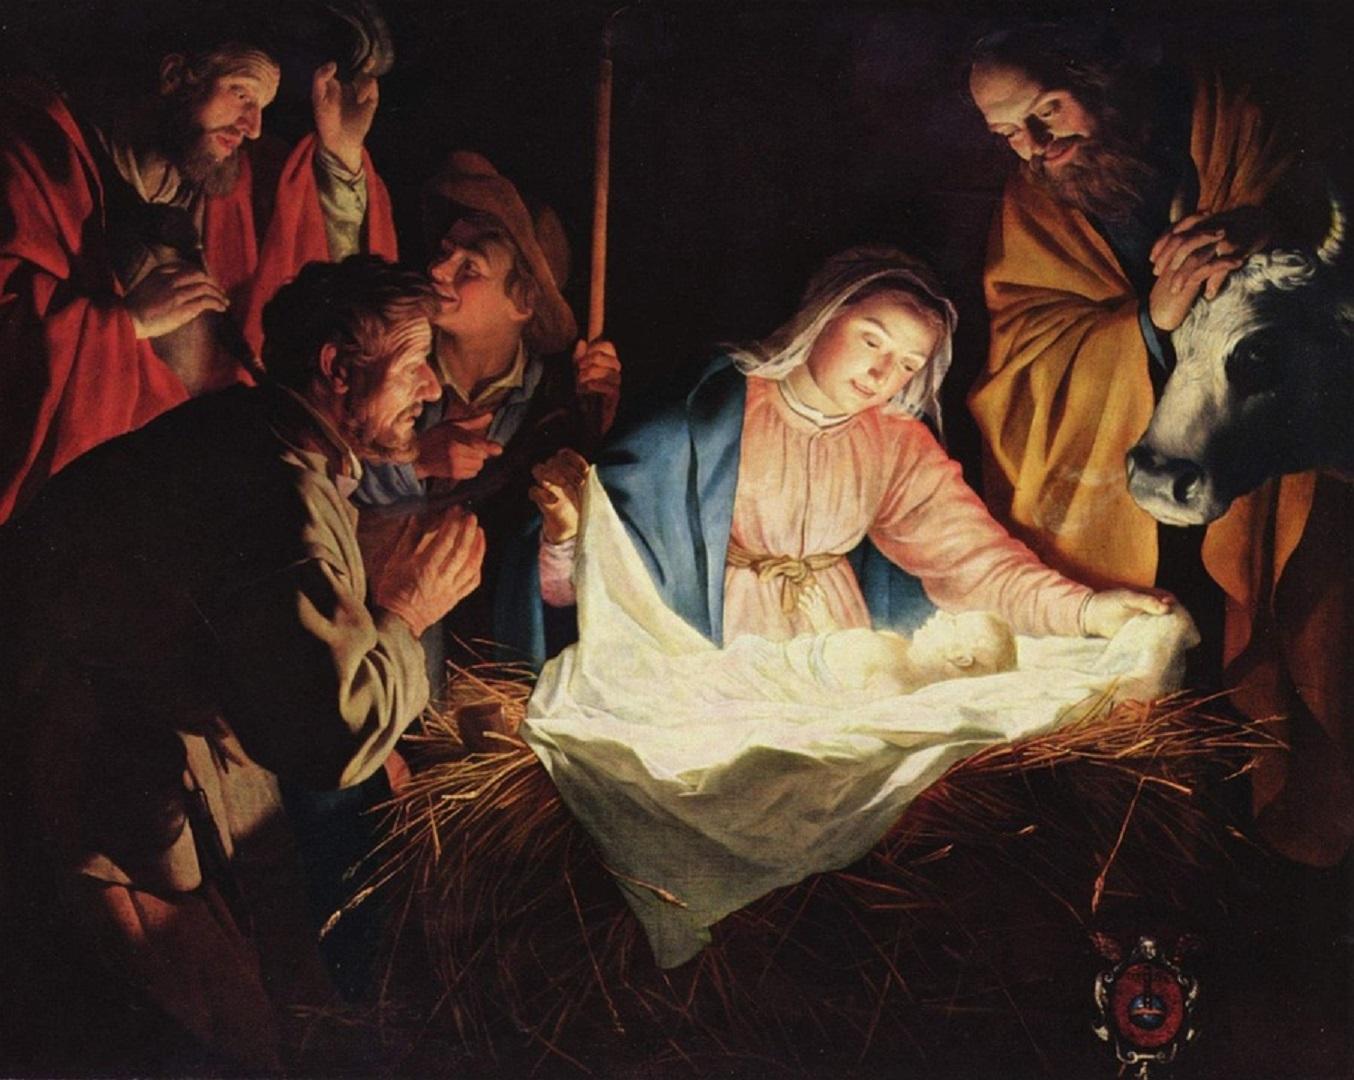 Nativity scene - Gerard van Honthorst (1592 - 1656)